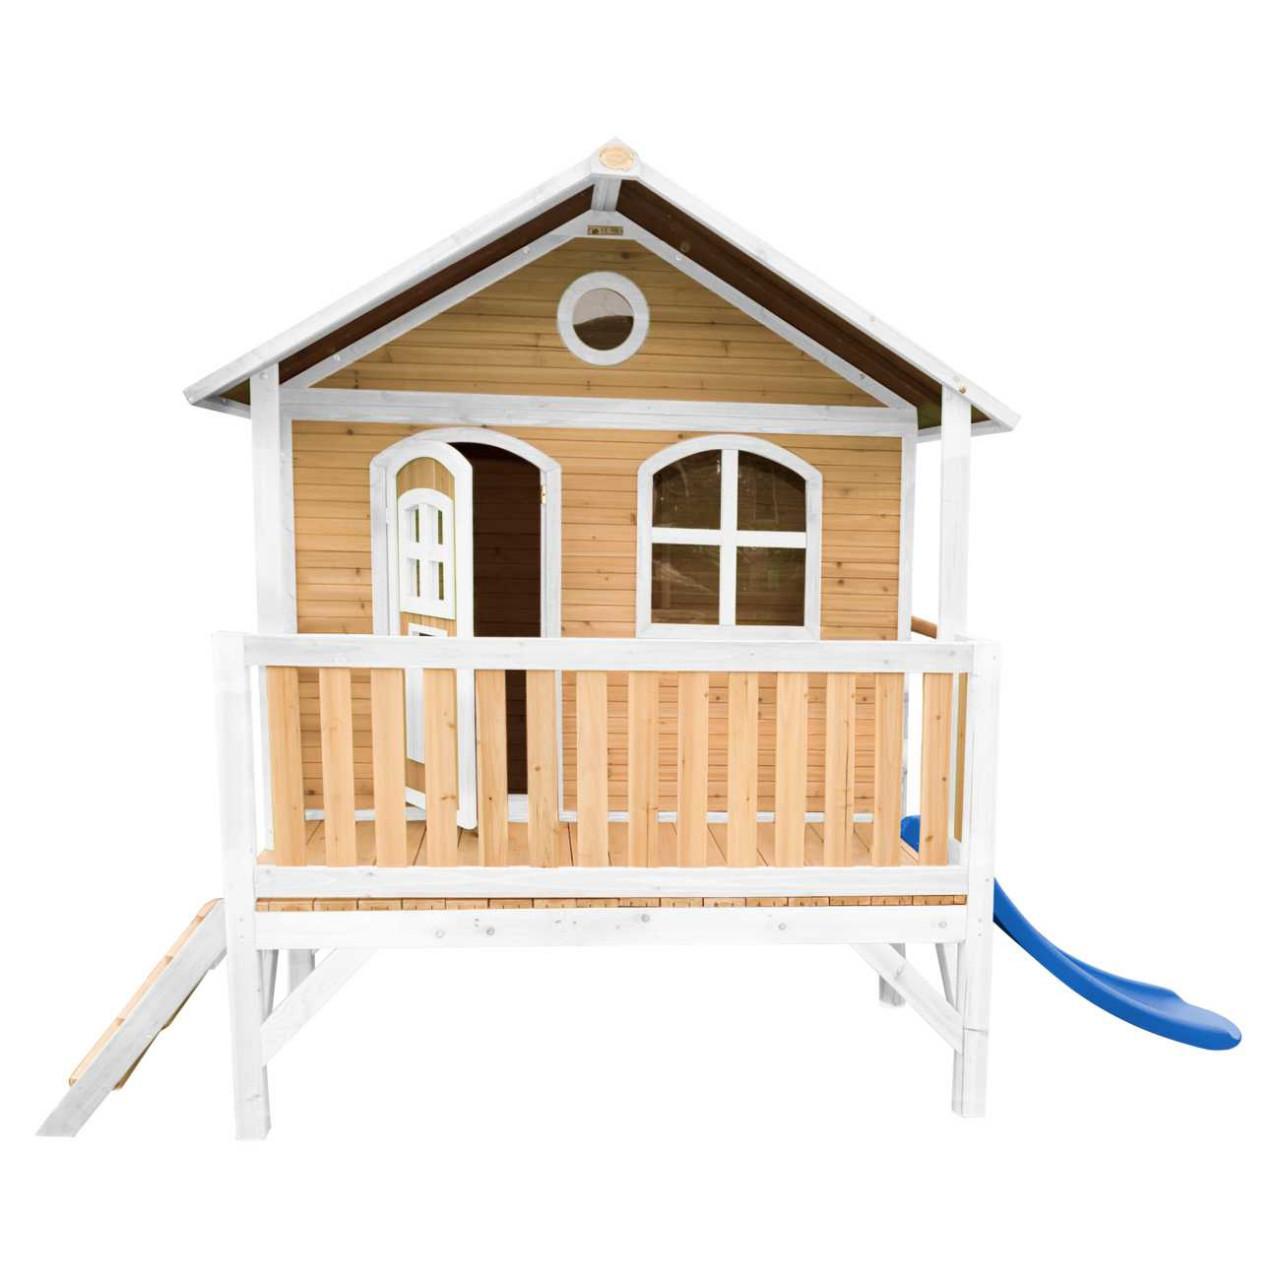 Axi Stelzenhaus Stef, Kinder Spielhaus